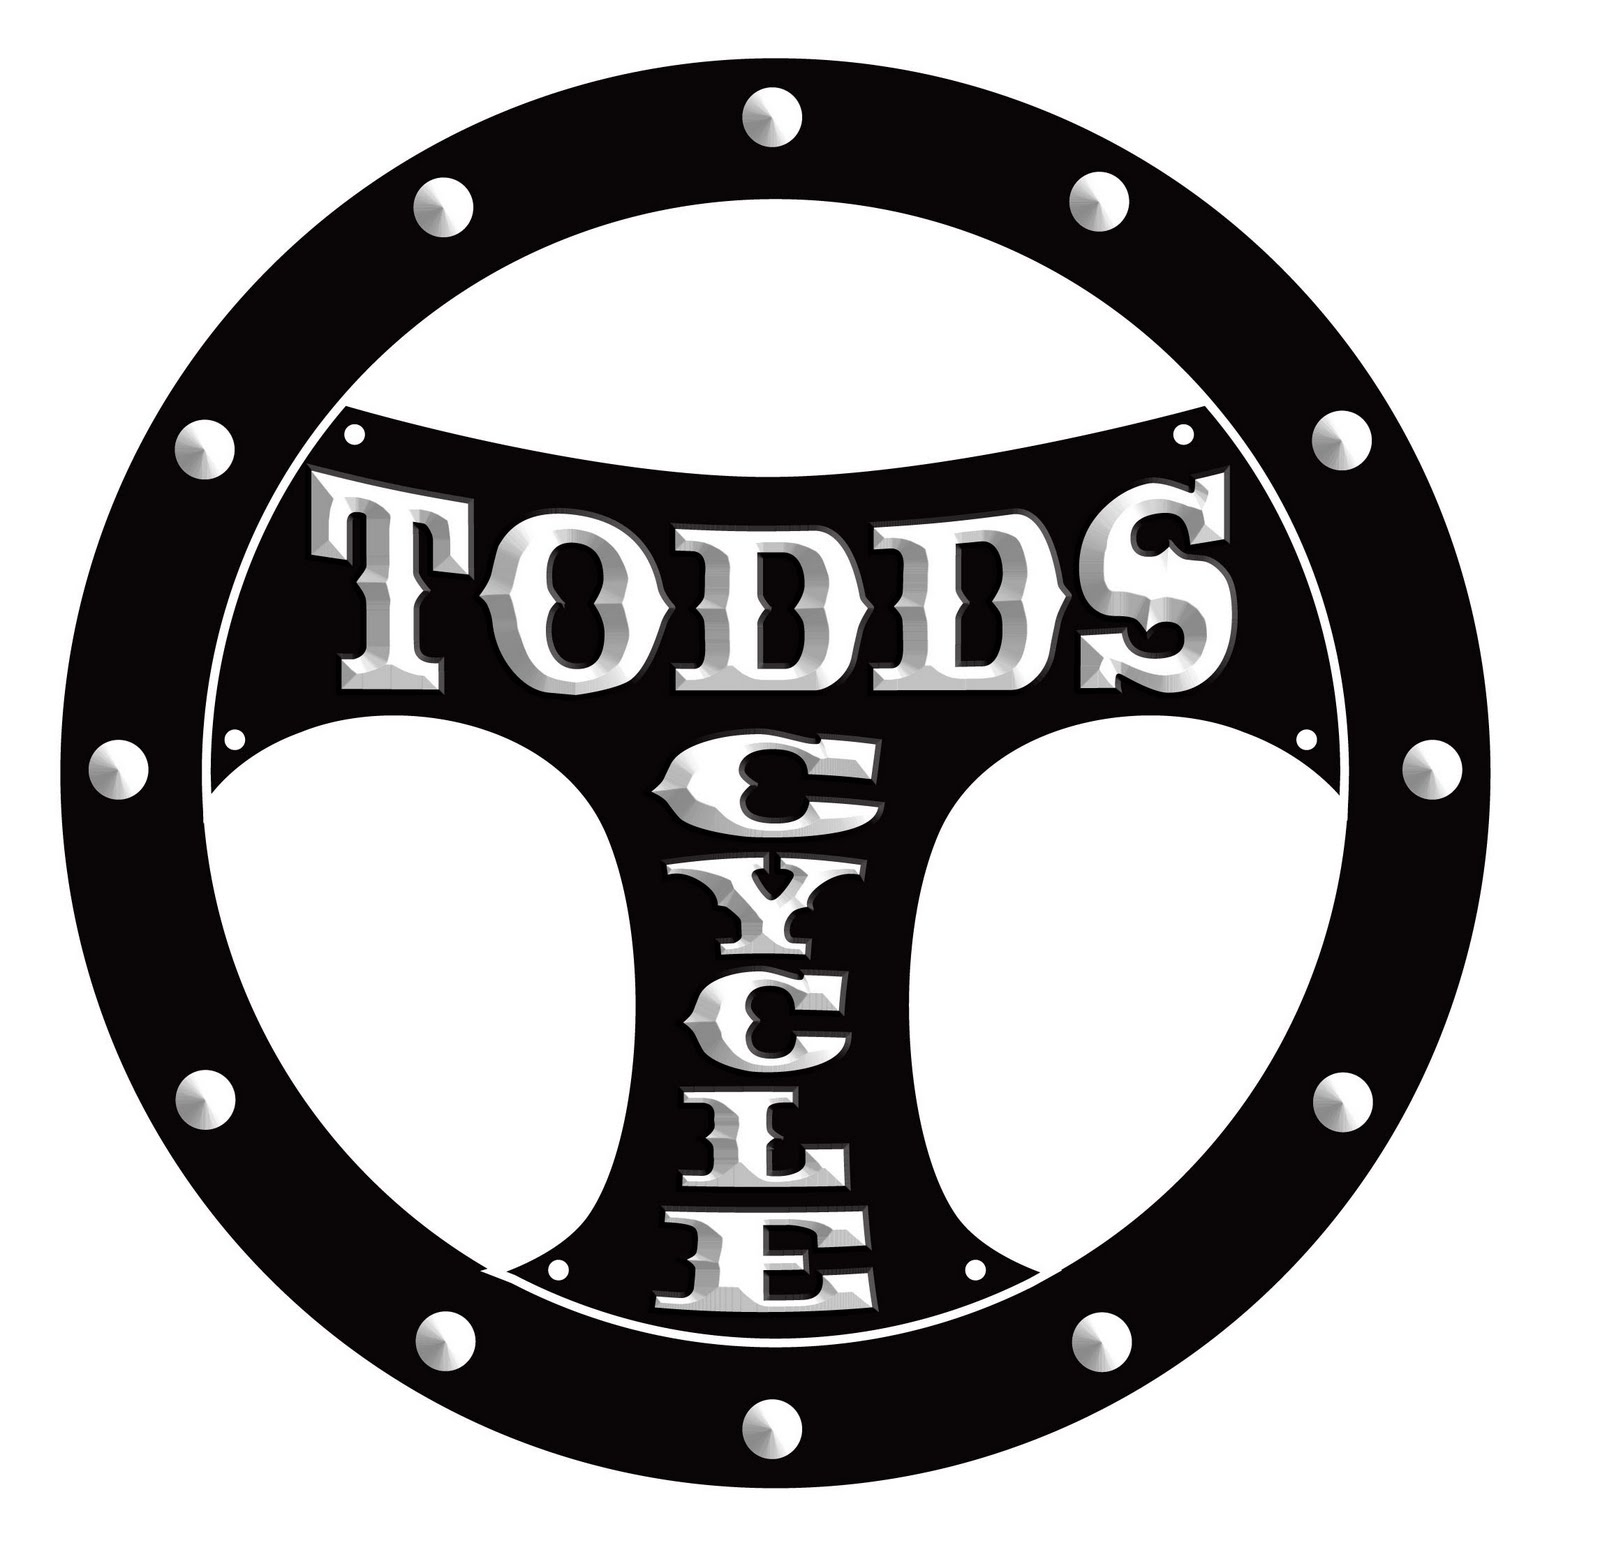 TODD'S CYCLE HANDLEBARS